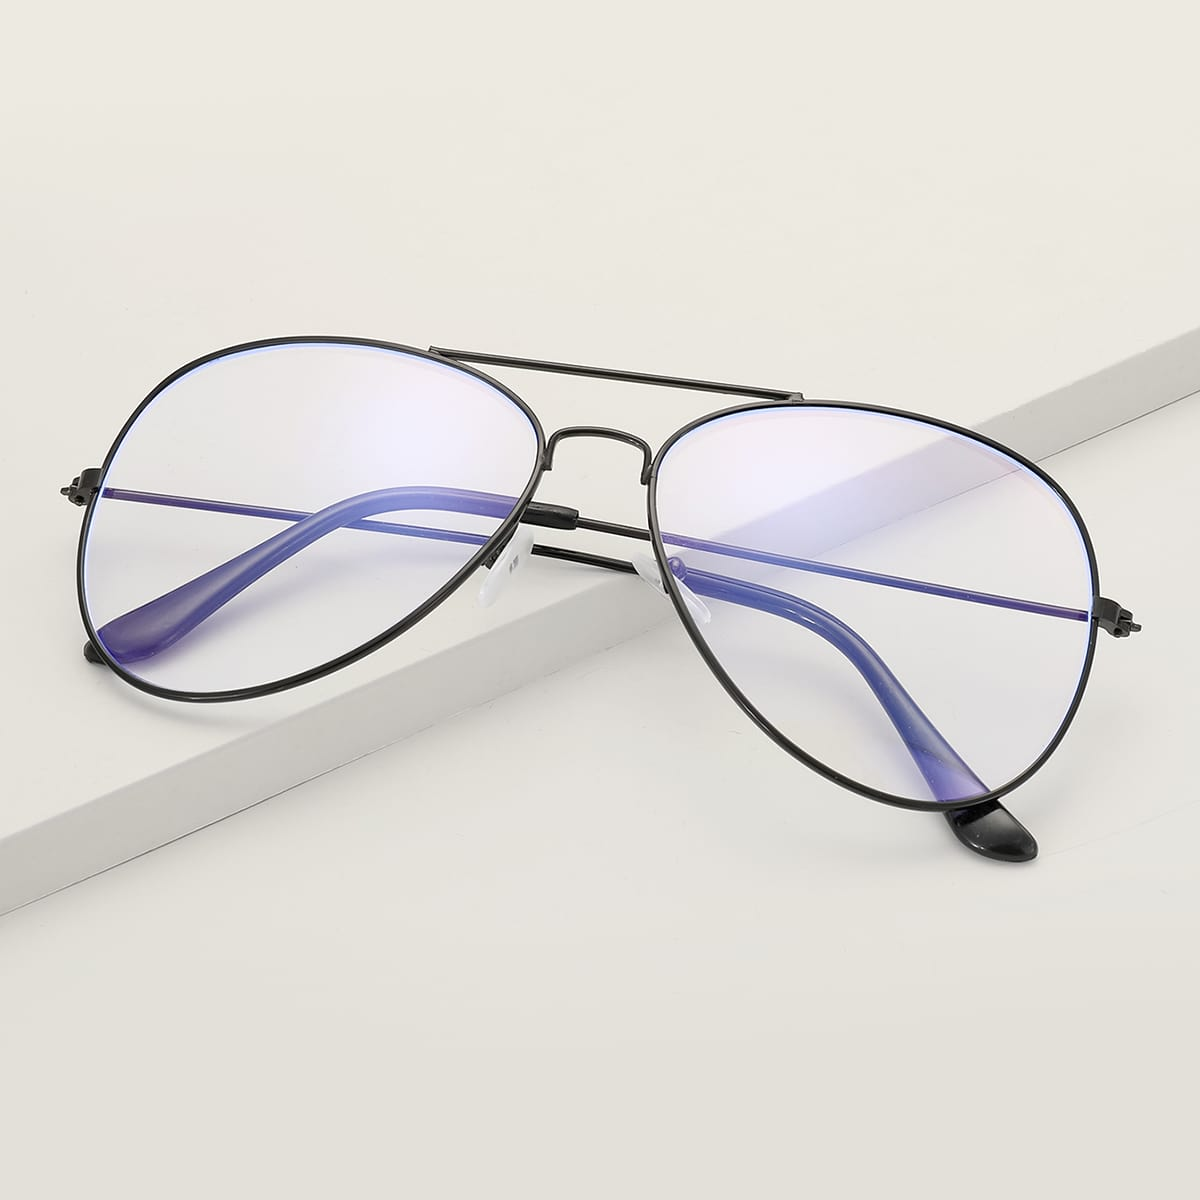 shein Topbar-bril voor heren